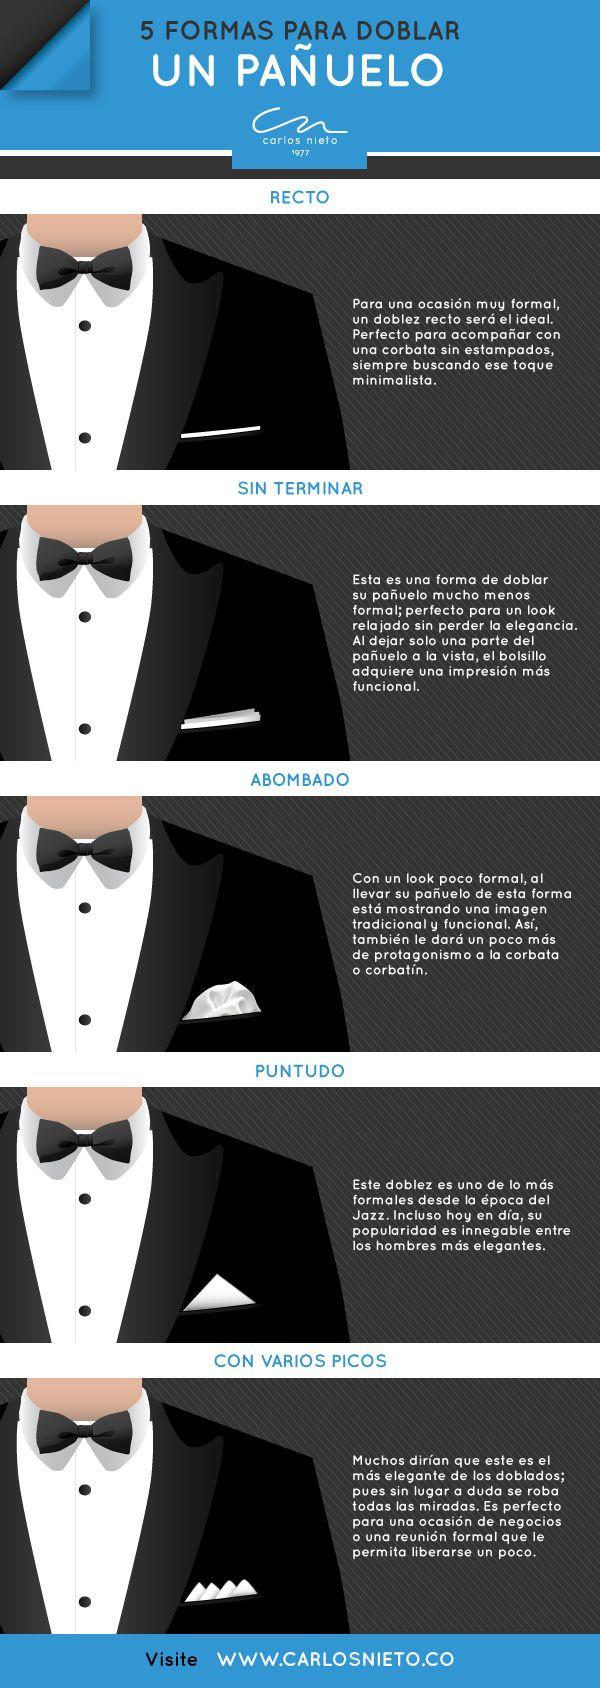 #EstiloCn 5 formas para doblar un pañuelo